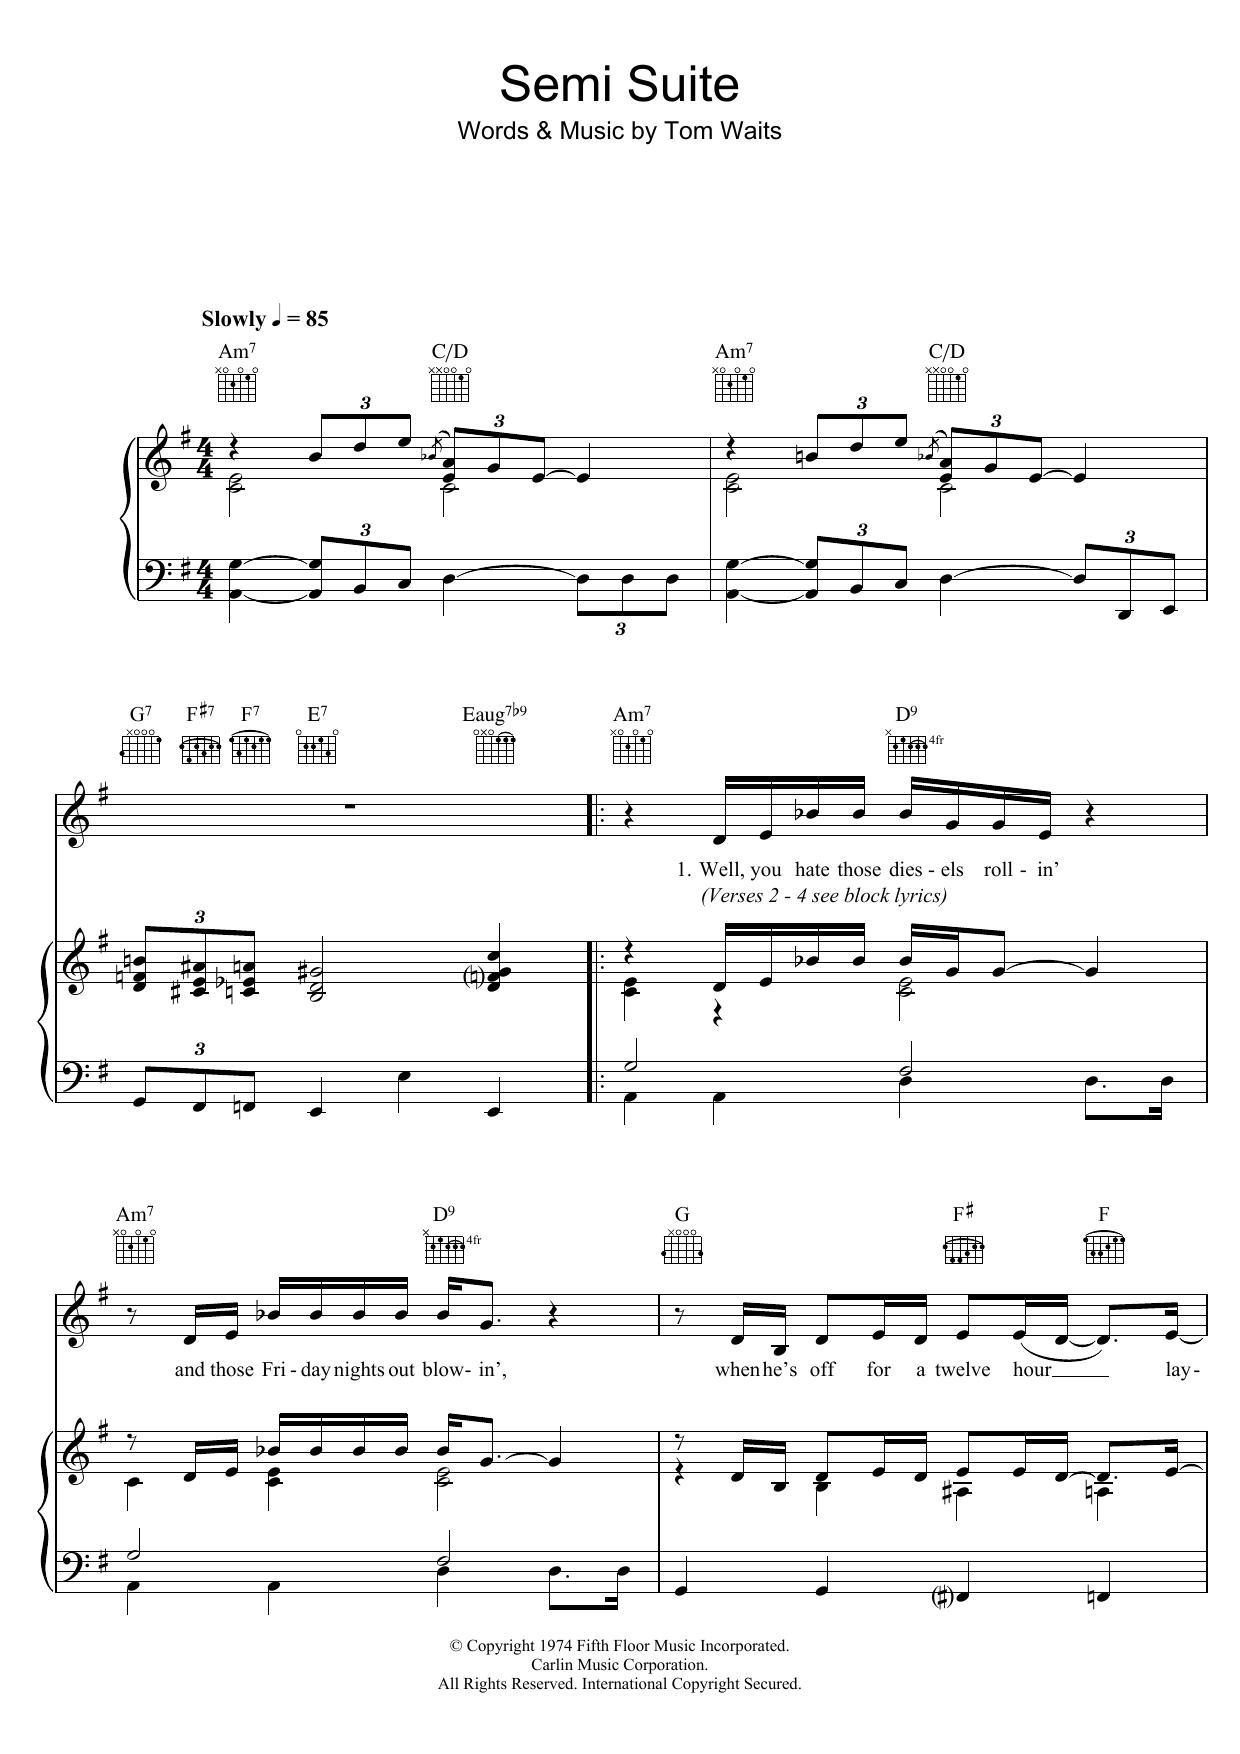 Tom Waits: Semi Suite